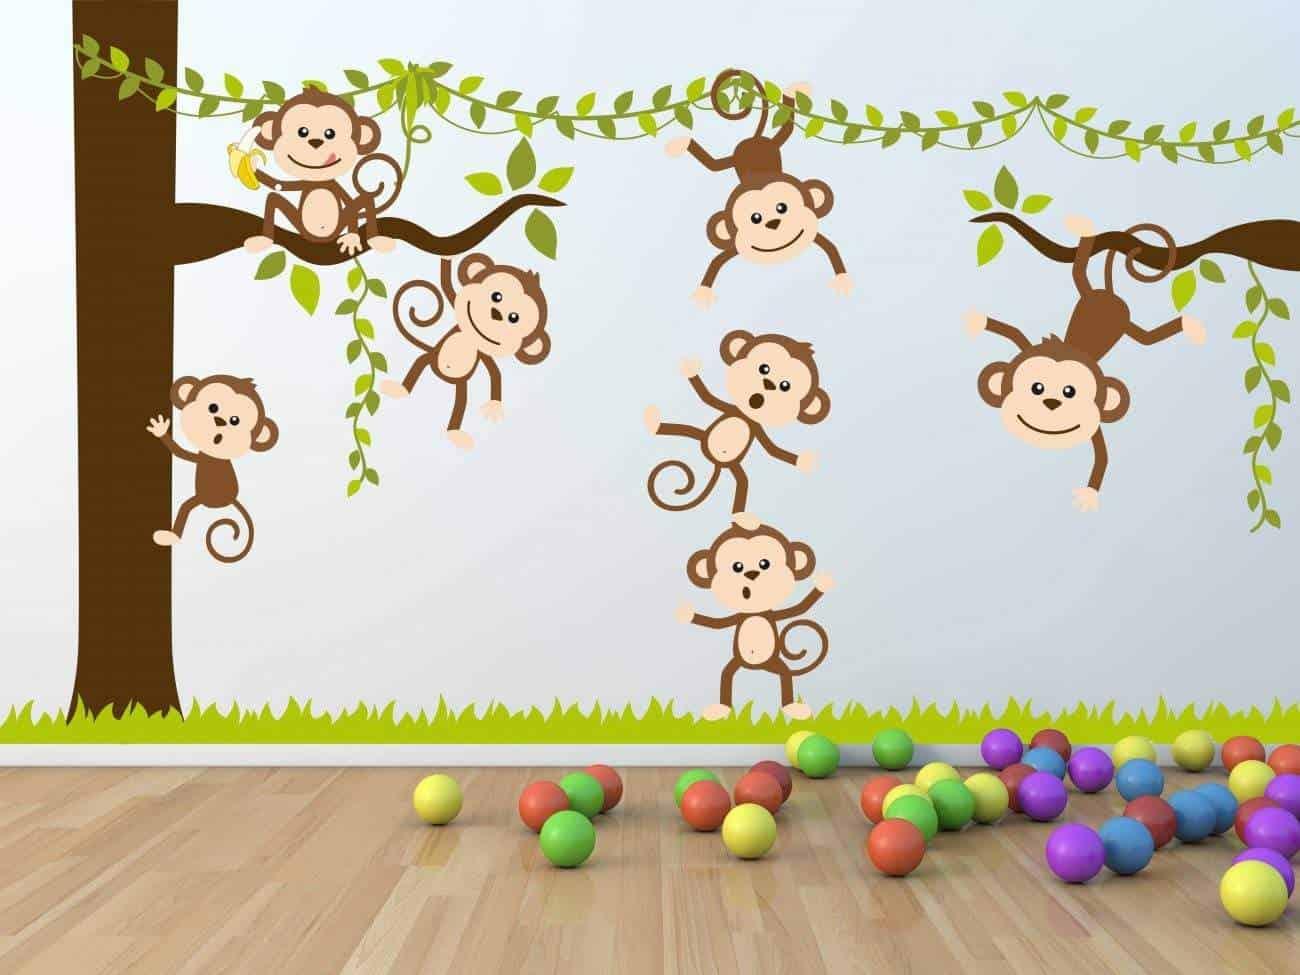 Monkey tree wall decal sticker Monkey tree wall decal sticker